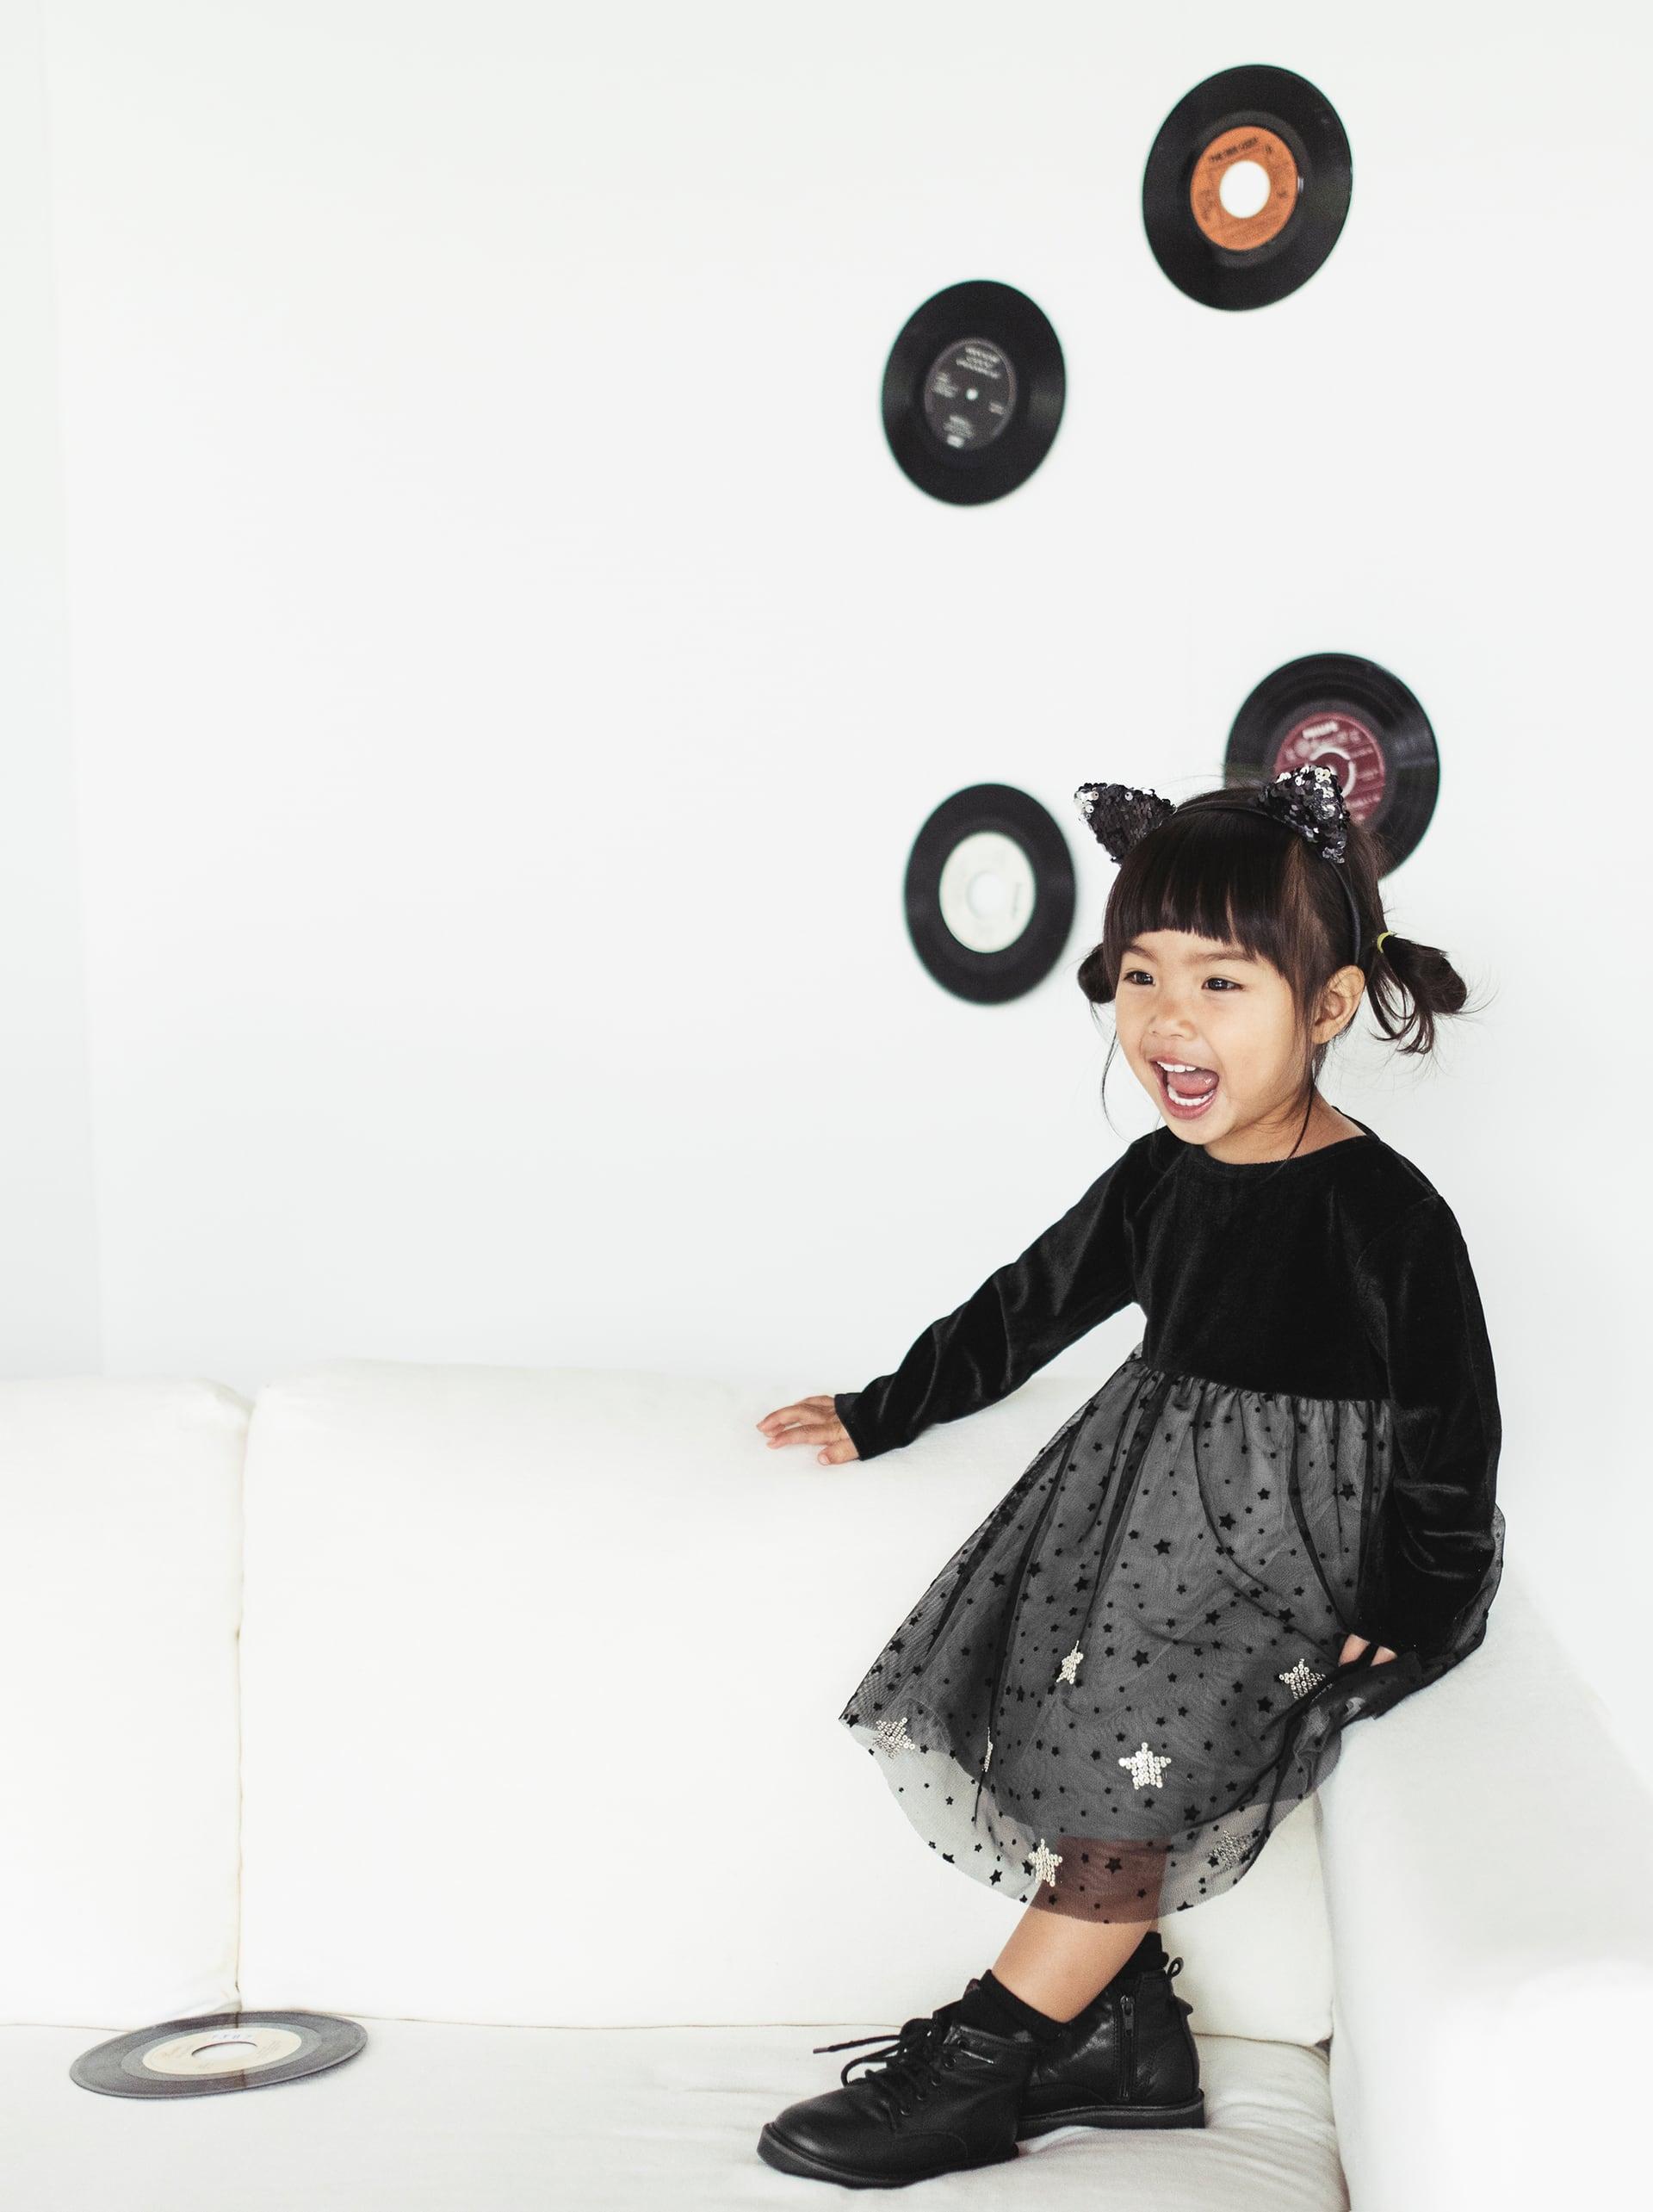 Feestelijk jurkje | Kinderfavorites